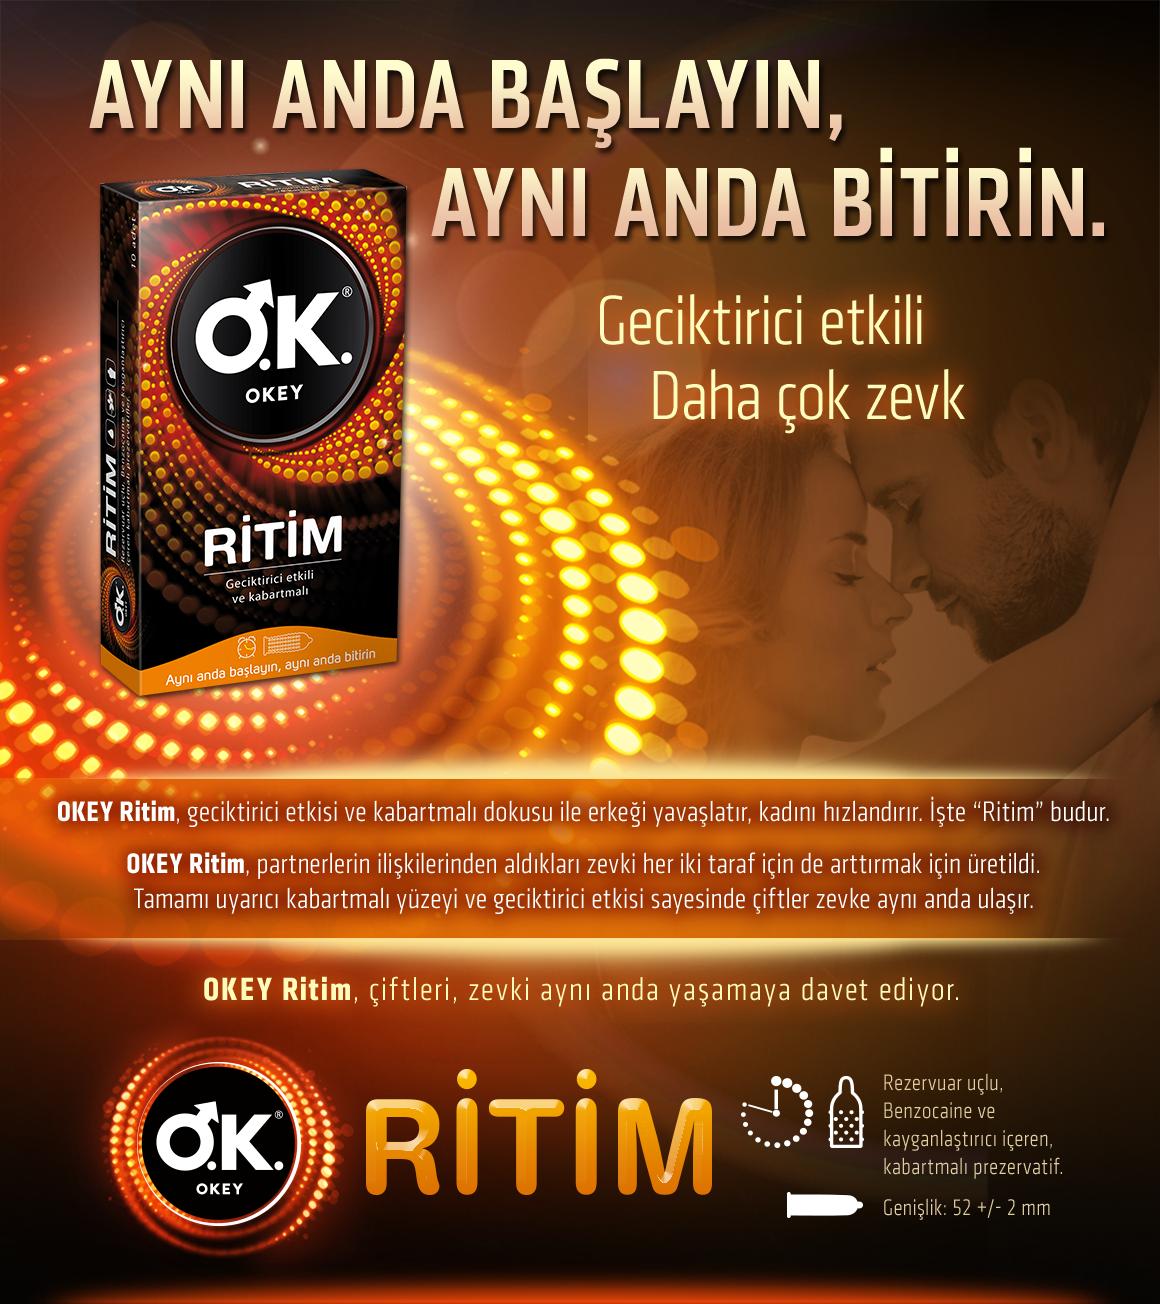 Okey Ritim